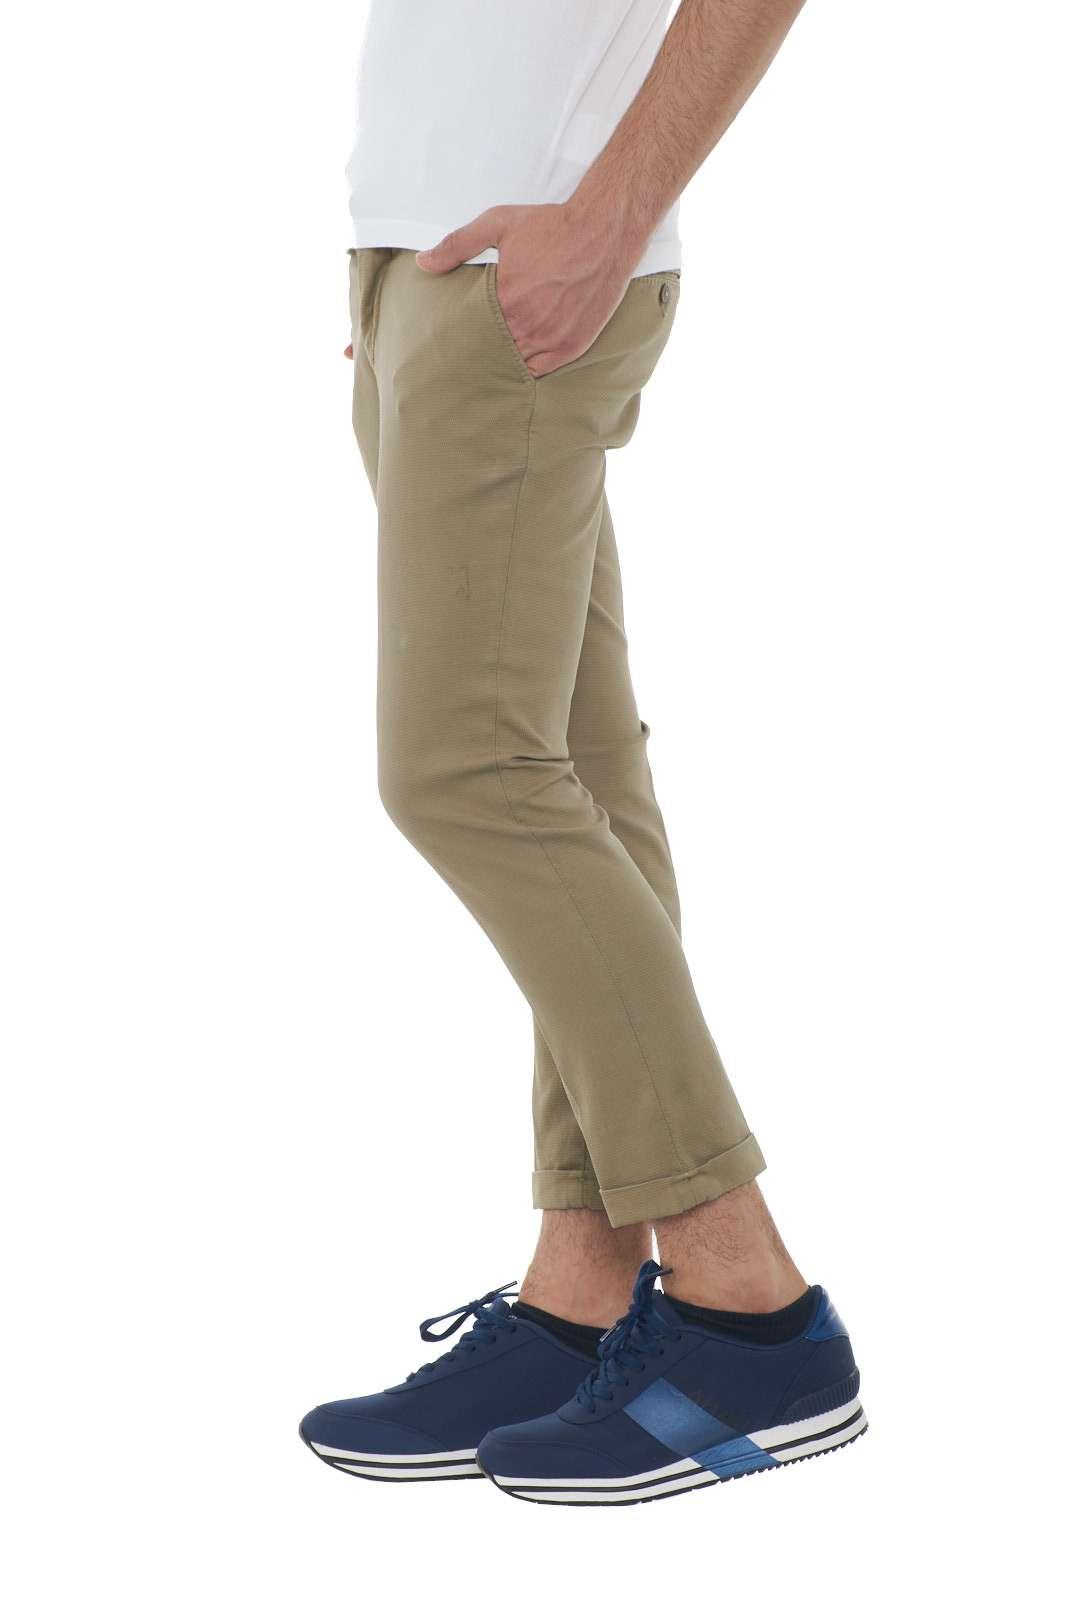 https://www.parmax.com/media/catalog/product/a/i/PE-outlet_parmax-pantaloni-uomo-Michael-Coal-MARLON2519-B.jpg